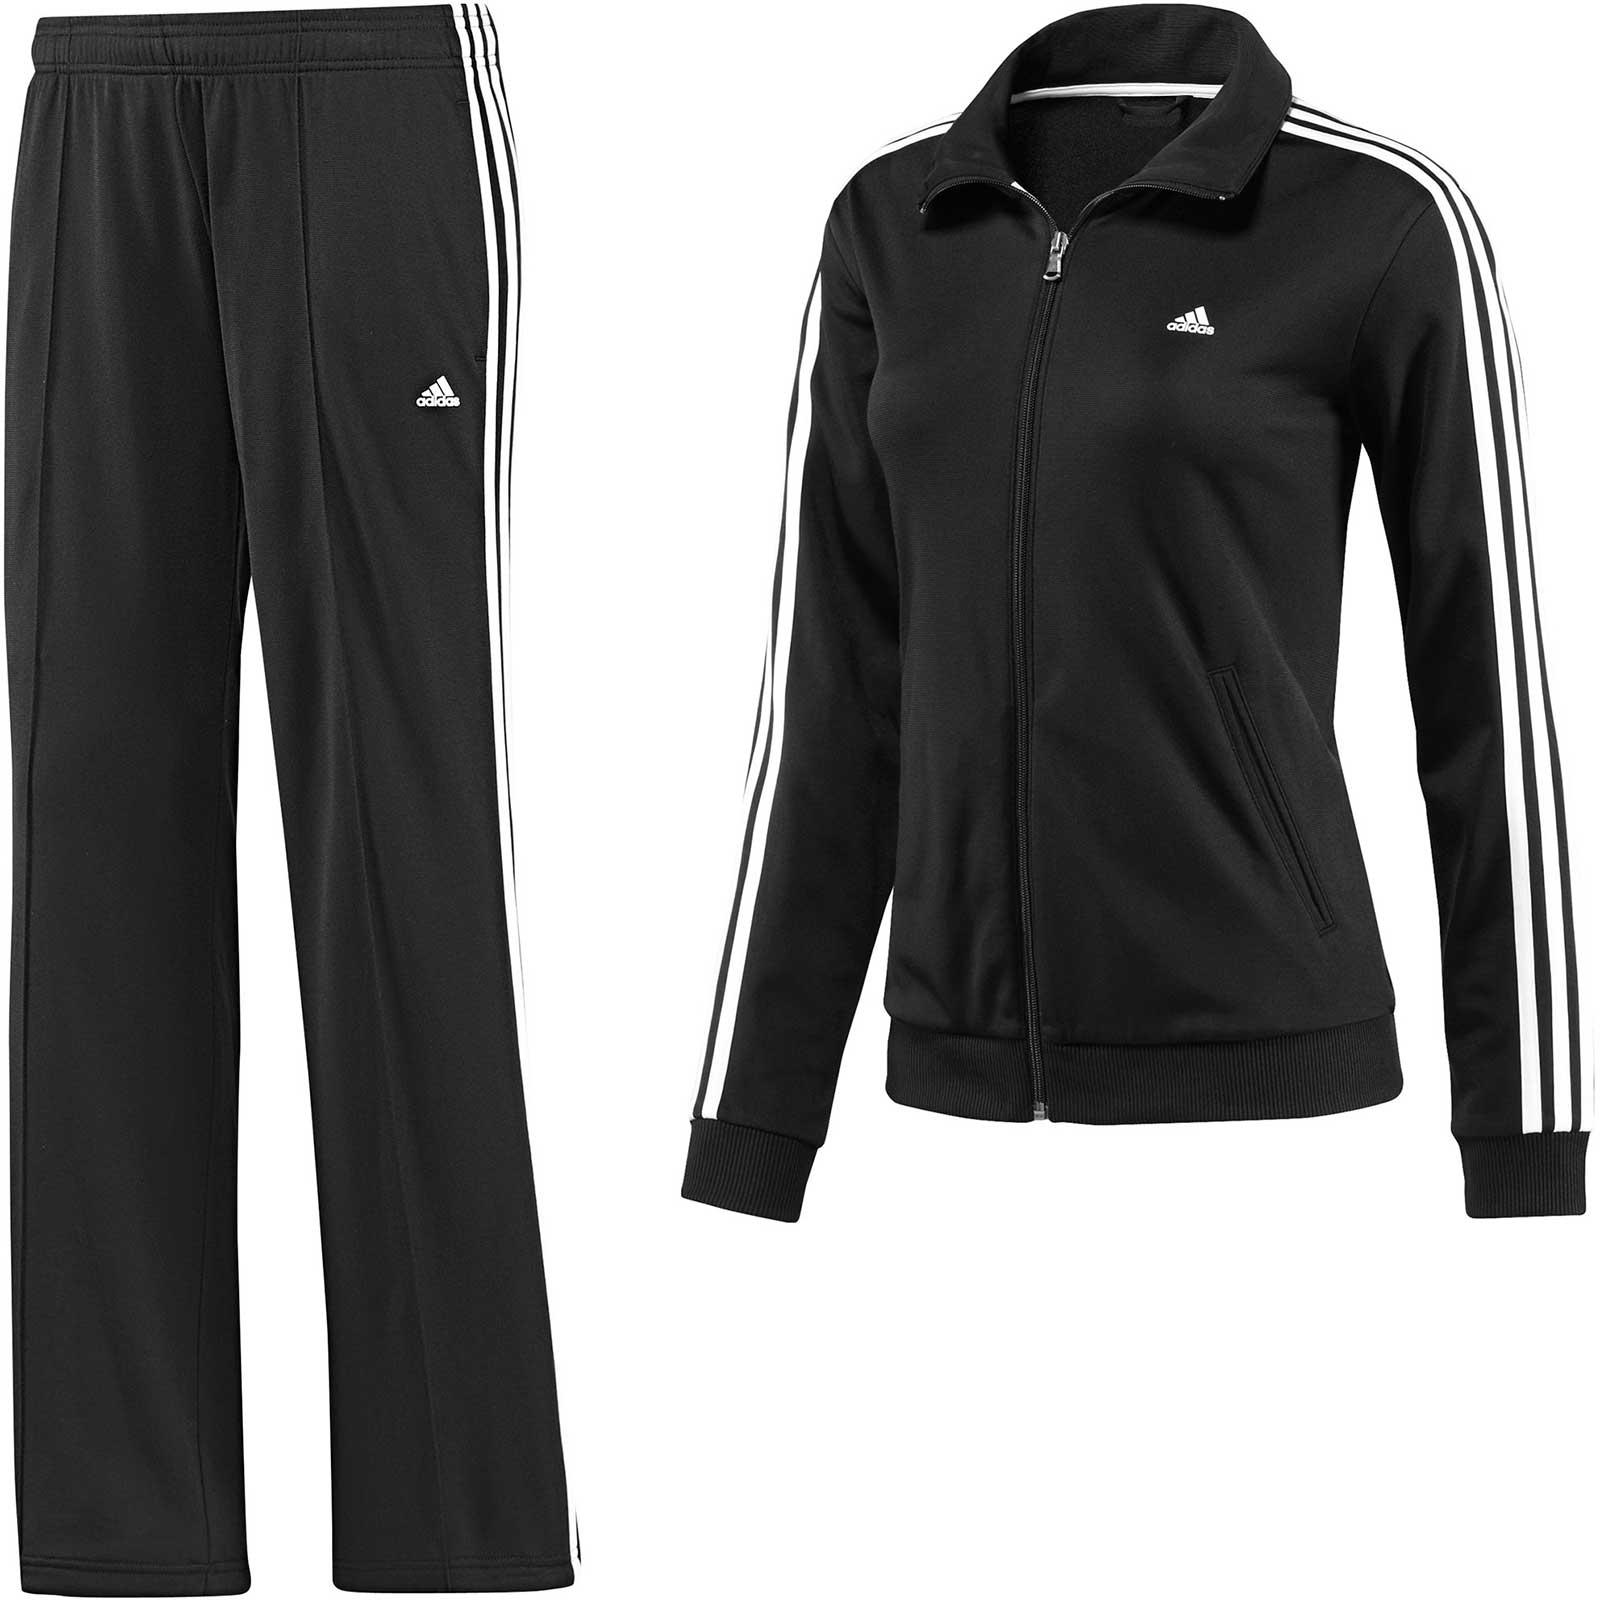 adidas diana suit trainingsanzug damen schwarz sportanzug ebay. Black Bedroom Furniture Sets. Home Design Ideas